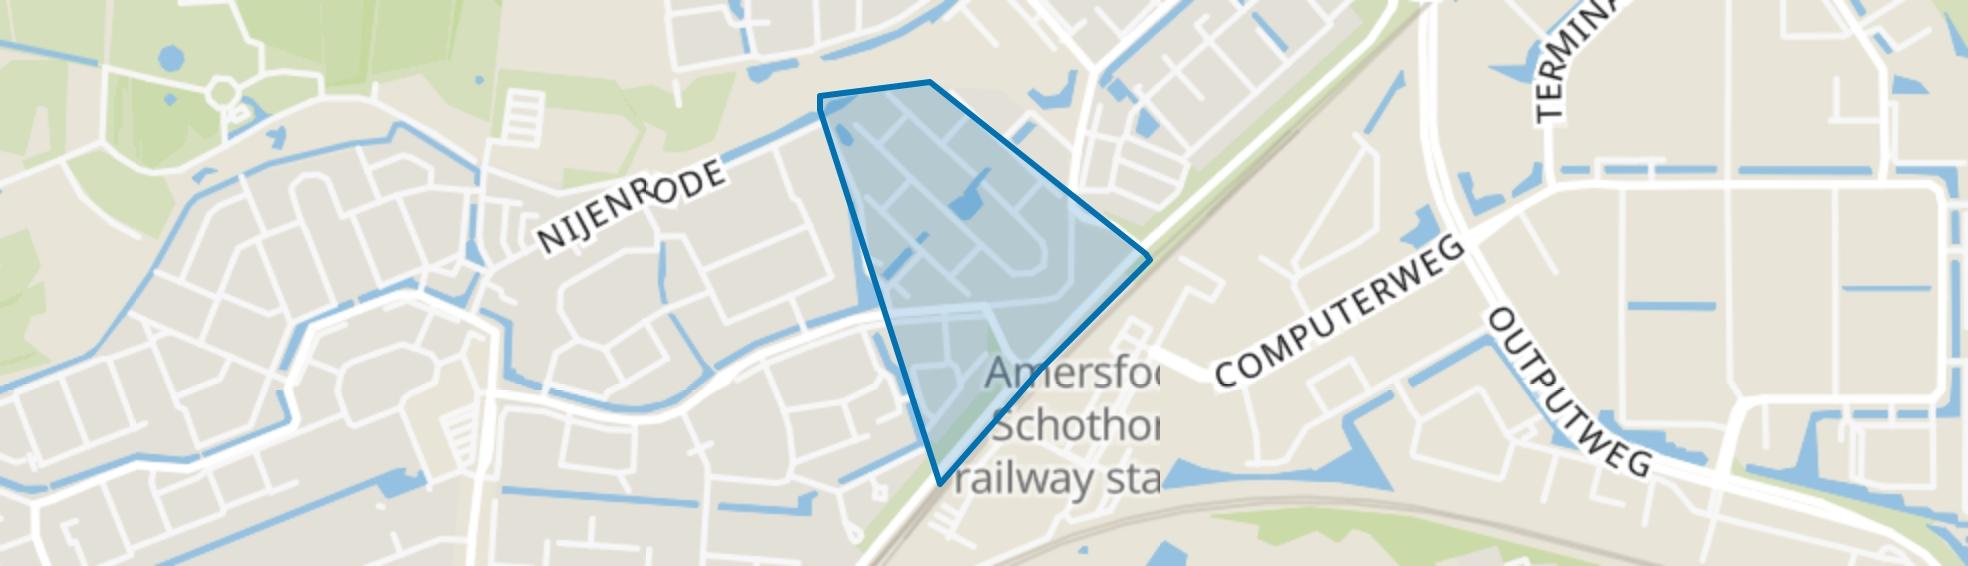 Het Gein, Amersfoort map